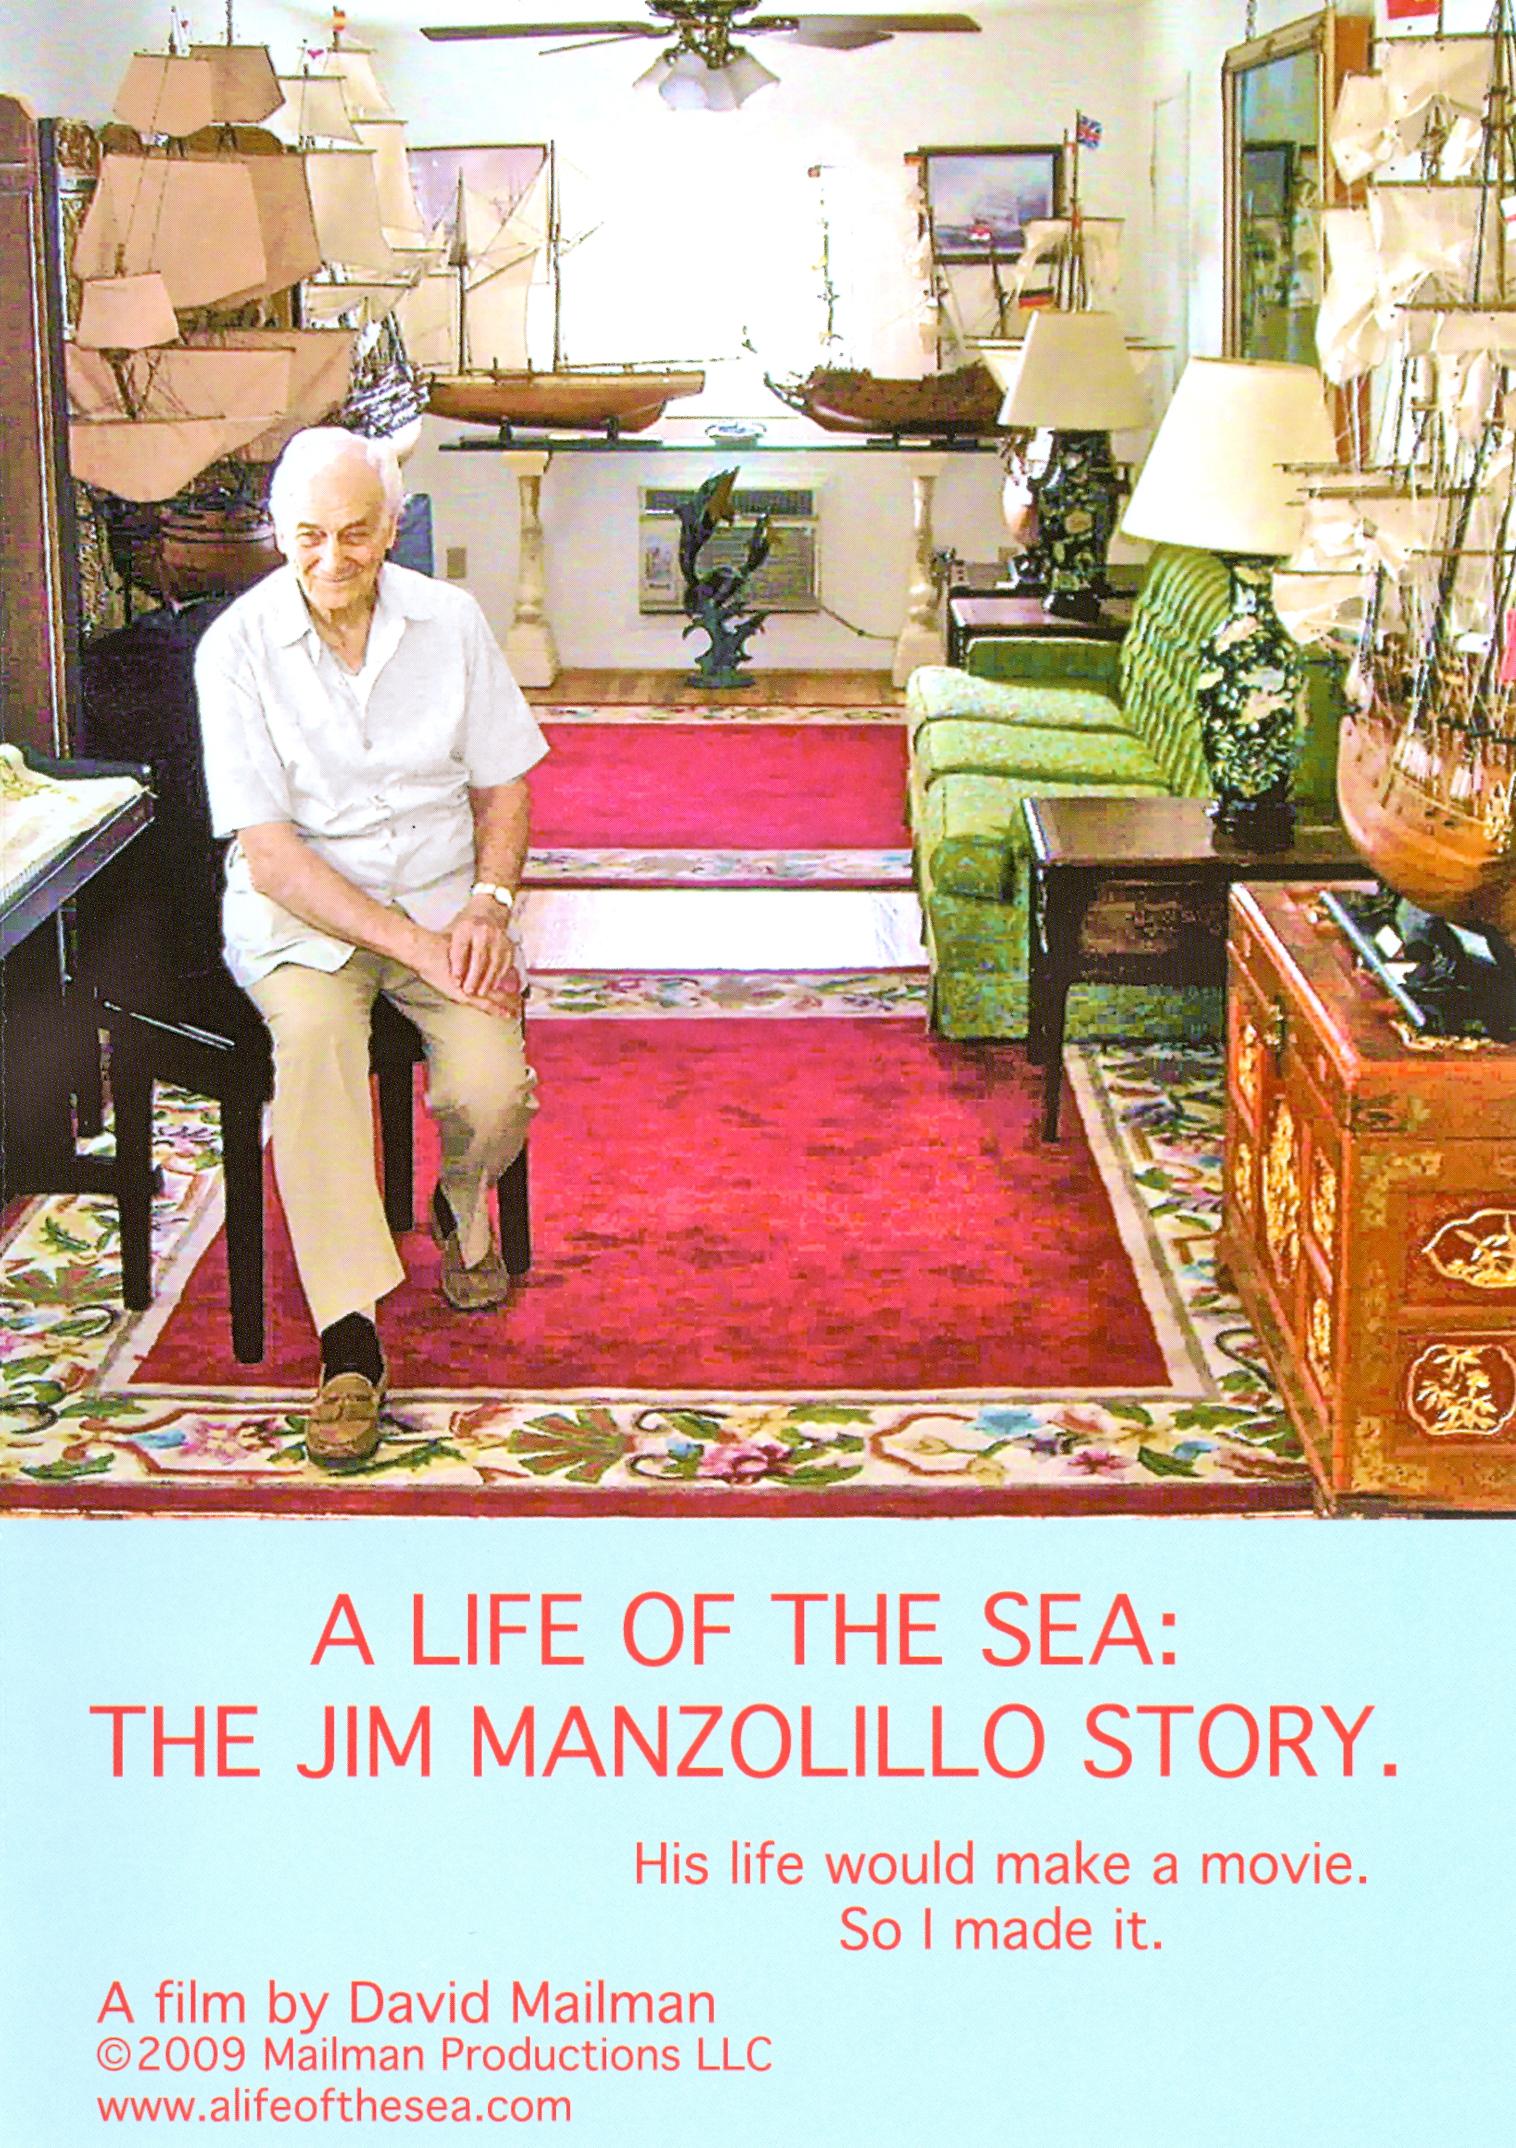 Life of the Sea: The Jim Manzolillo Story